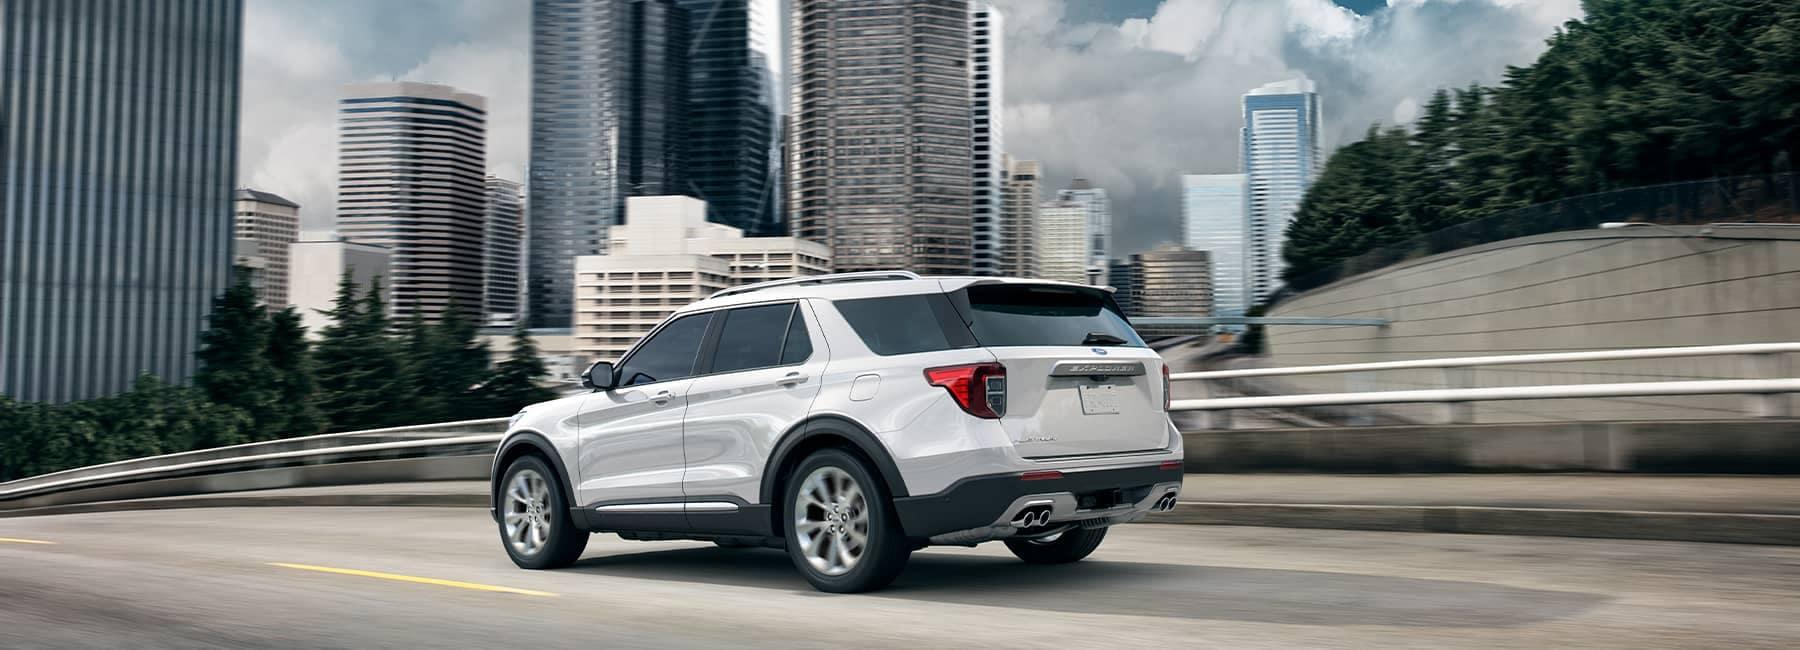 White 2021 Ford Explorer driving through a metropolis